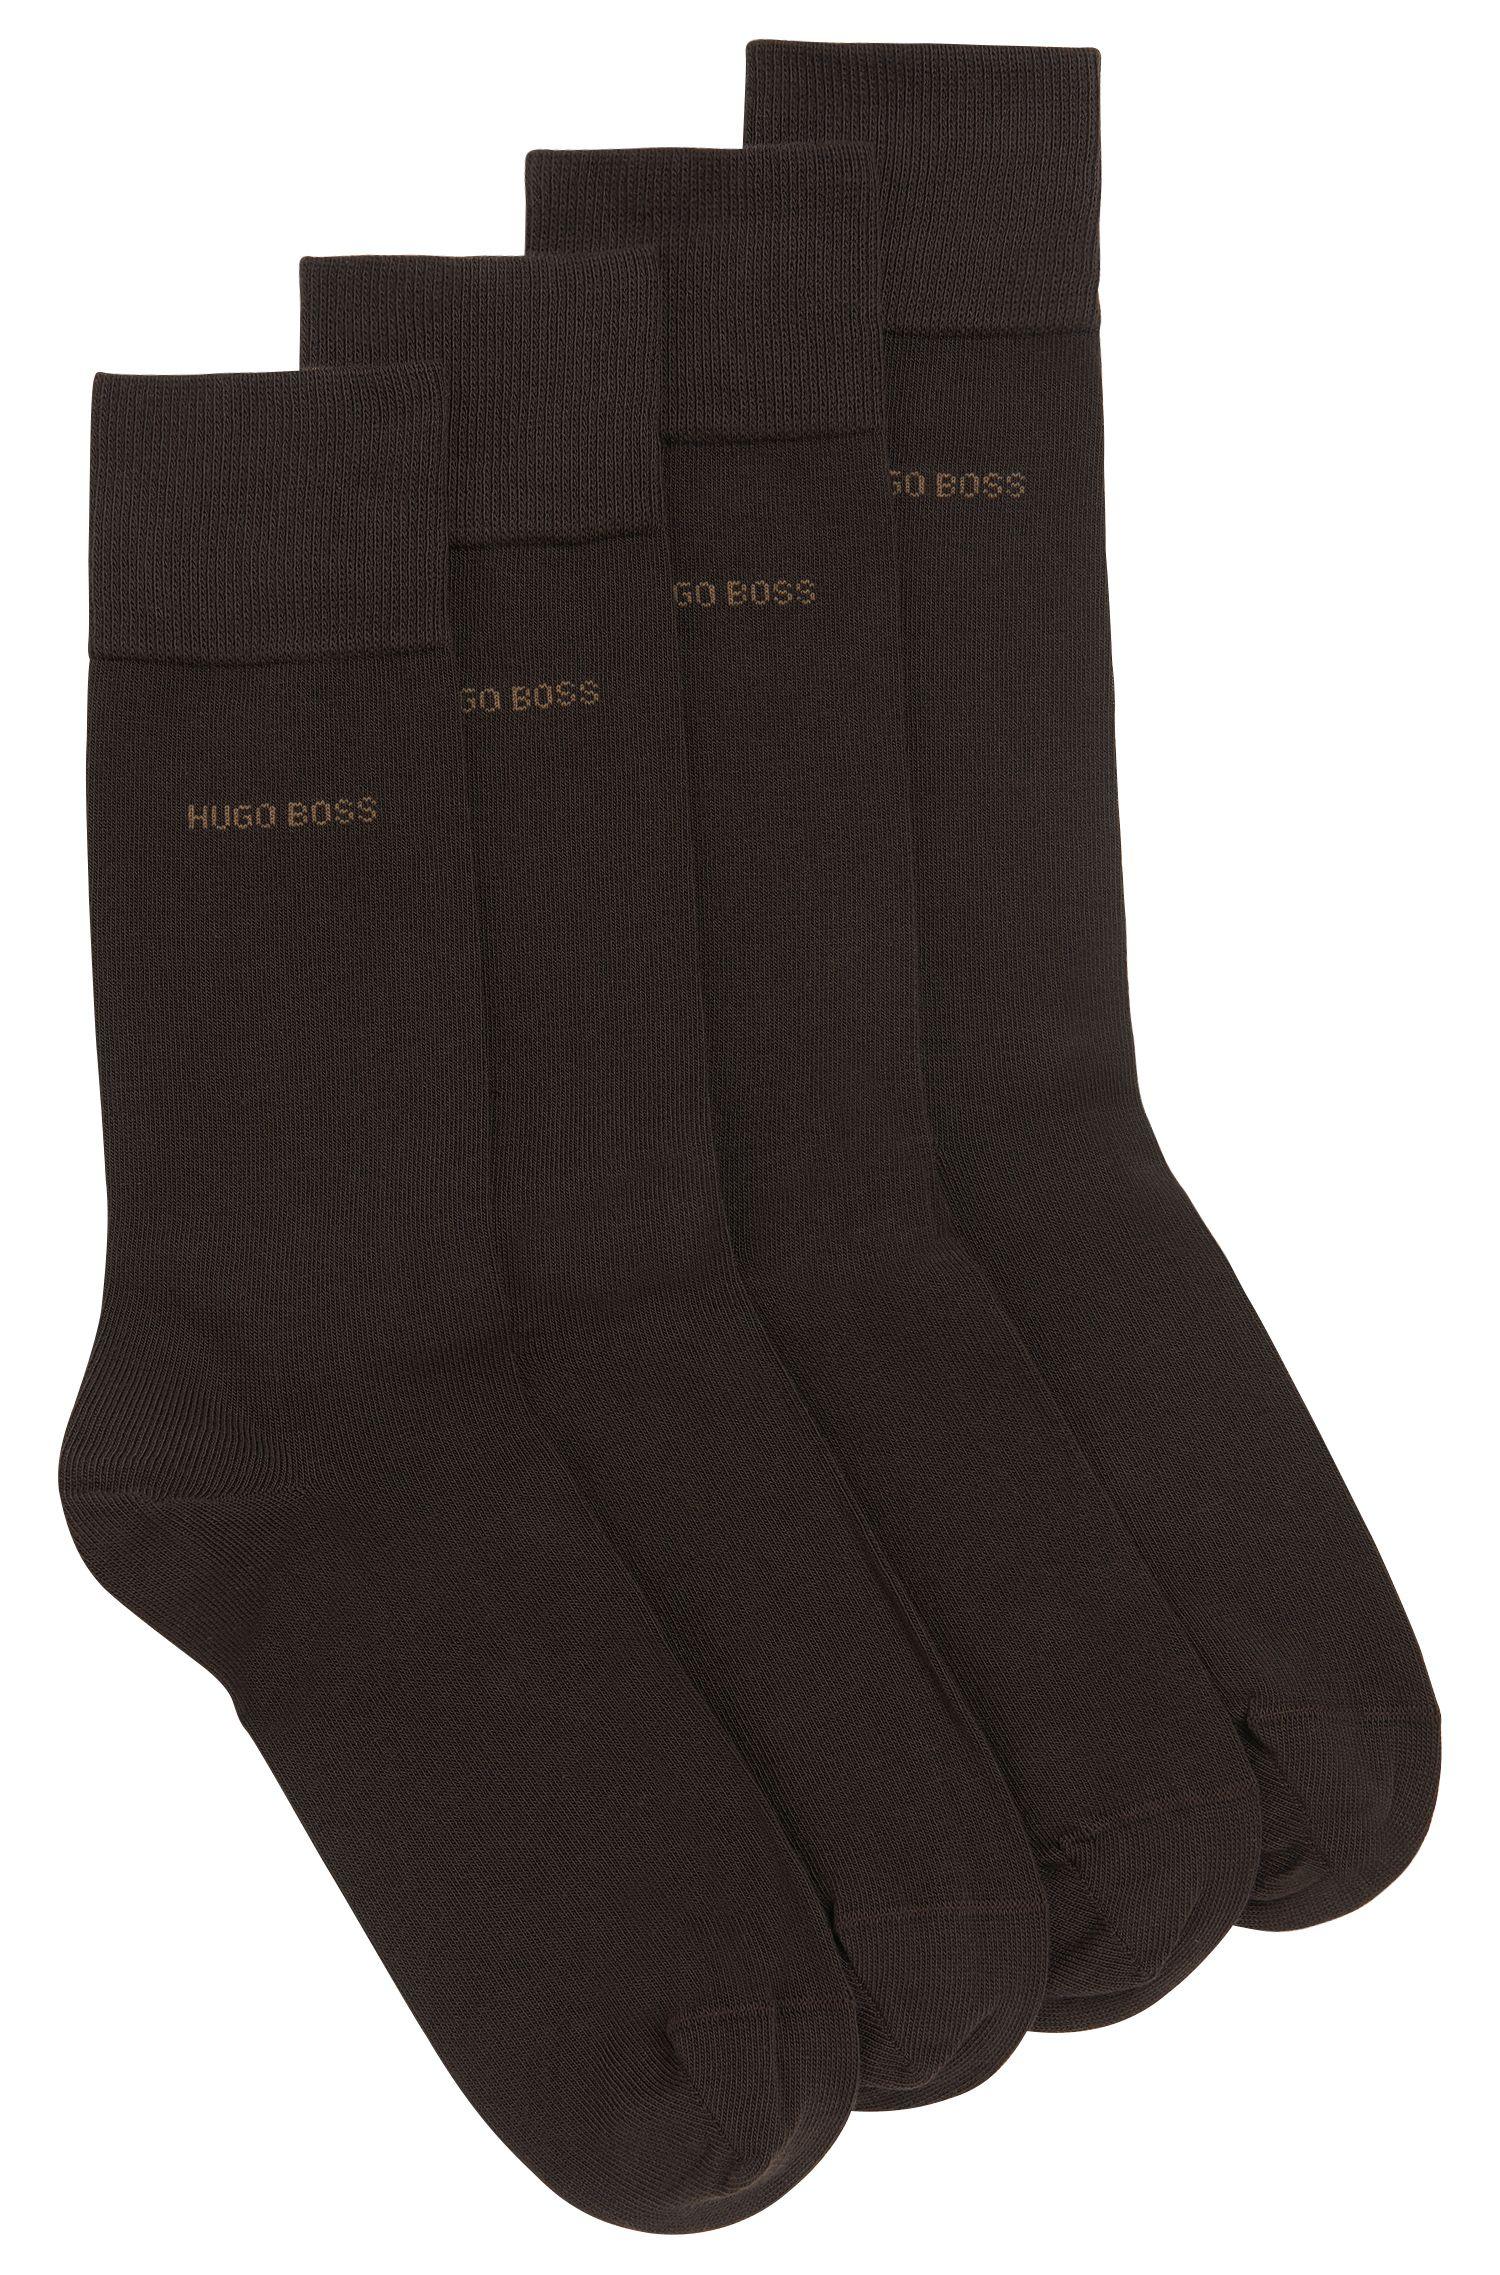 Zweier-Pack Socken aus elastischem Baumwoll-Mix , Dunkelbraun